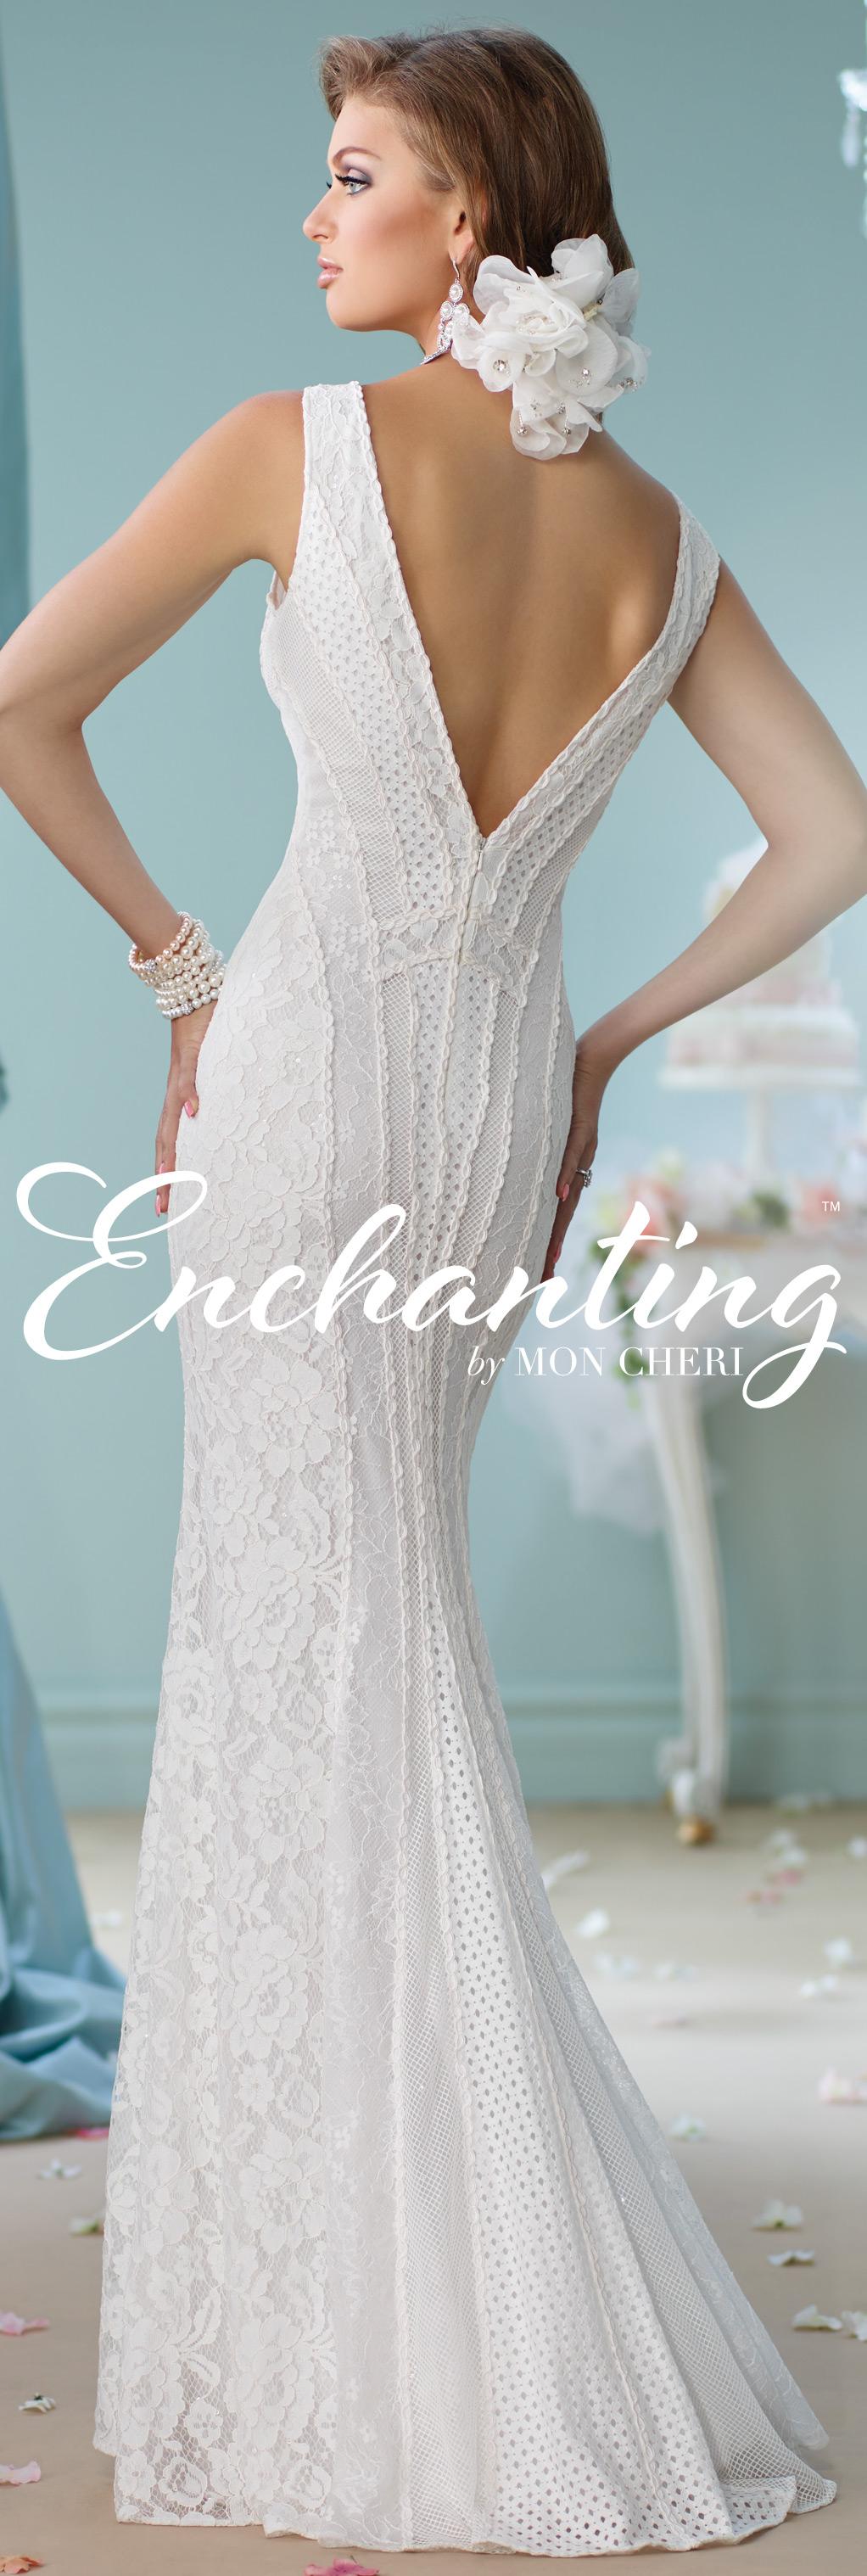 Modern Wedding Dresses 2018 by Mon Cheri | Enchanted, Wedding dress ...